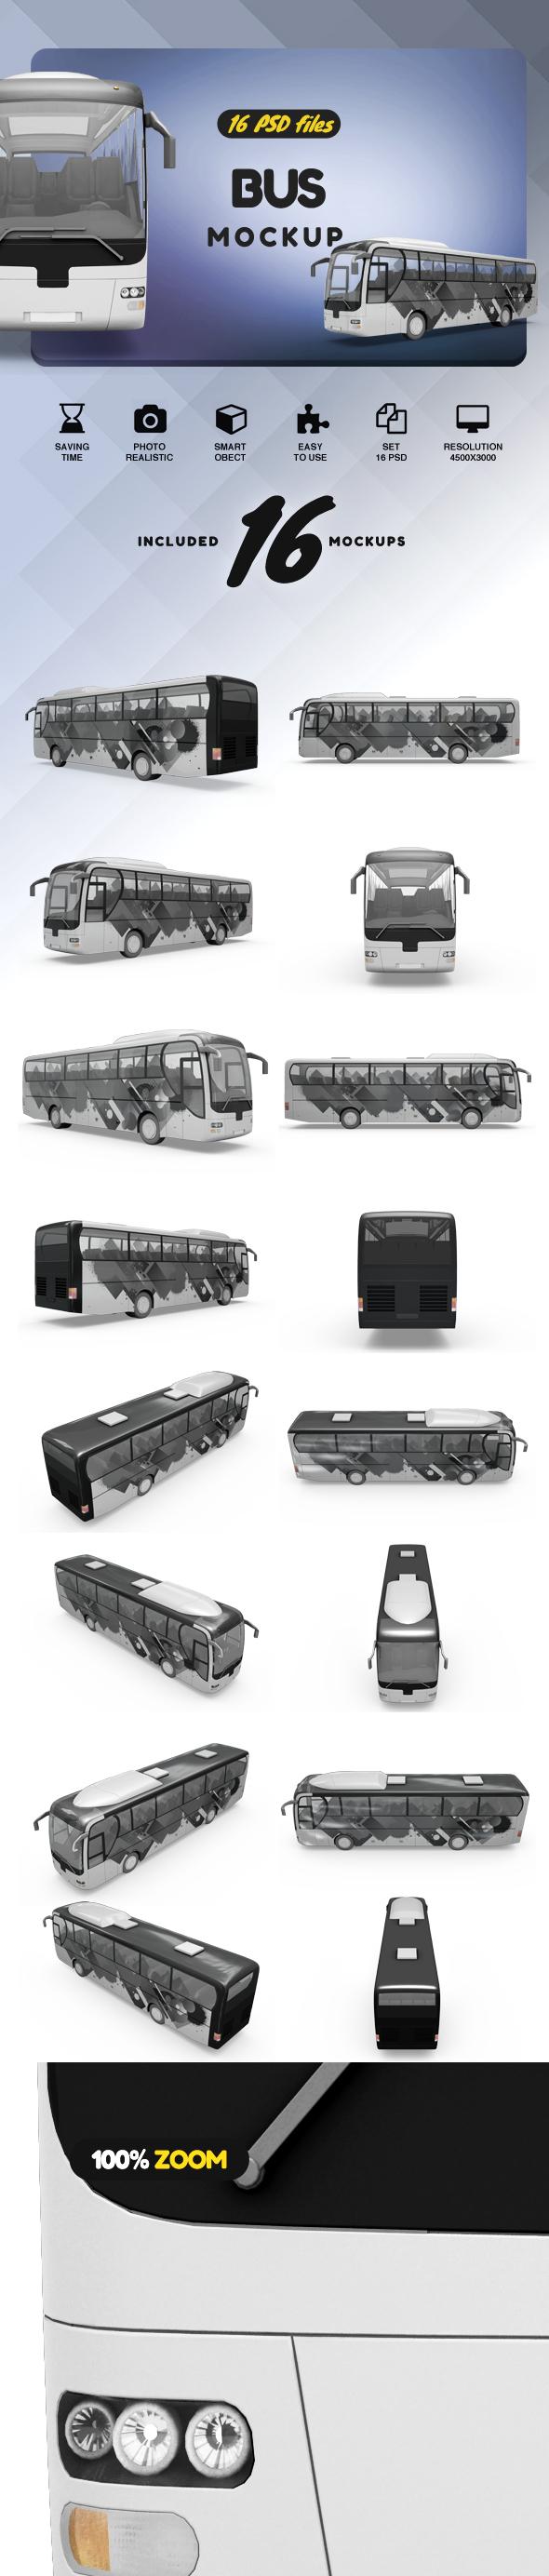 Bus Mockup example image 2